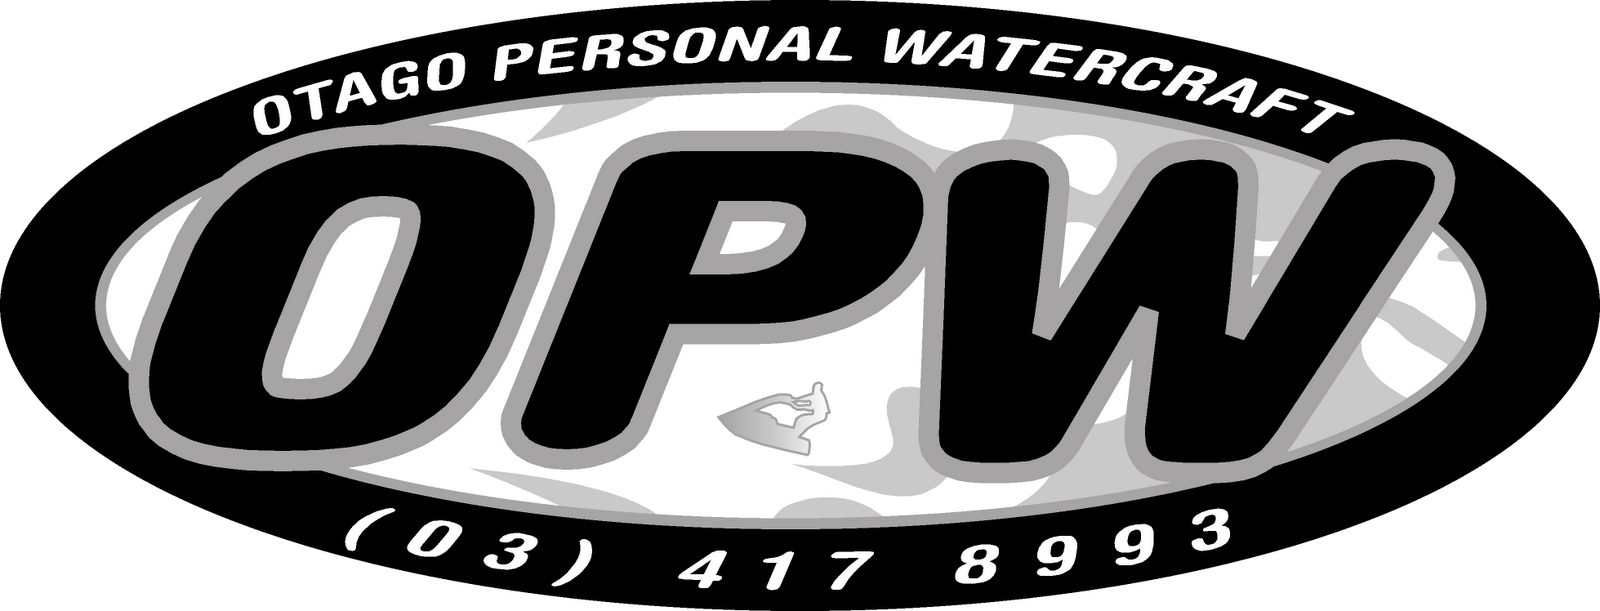 Otago Personal Watercraft